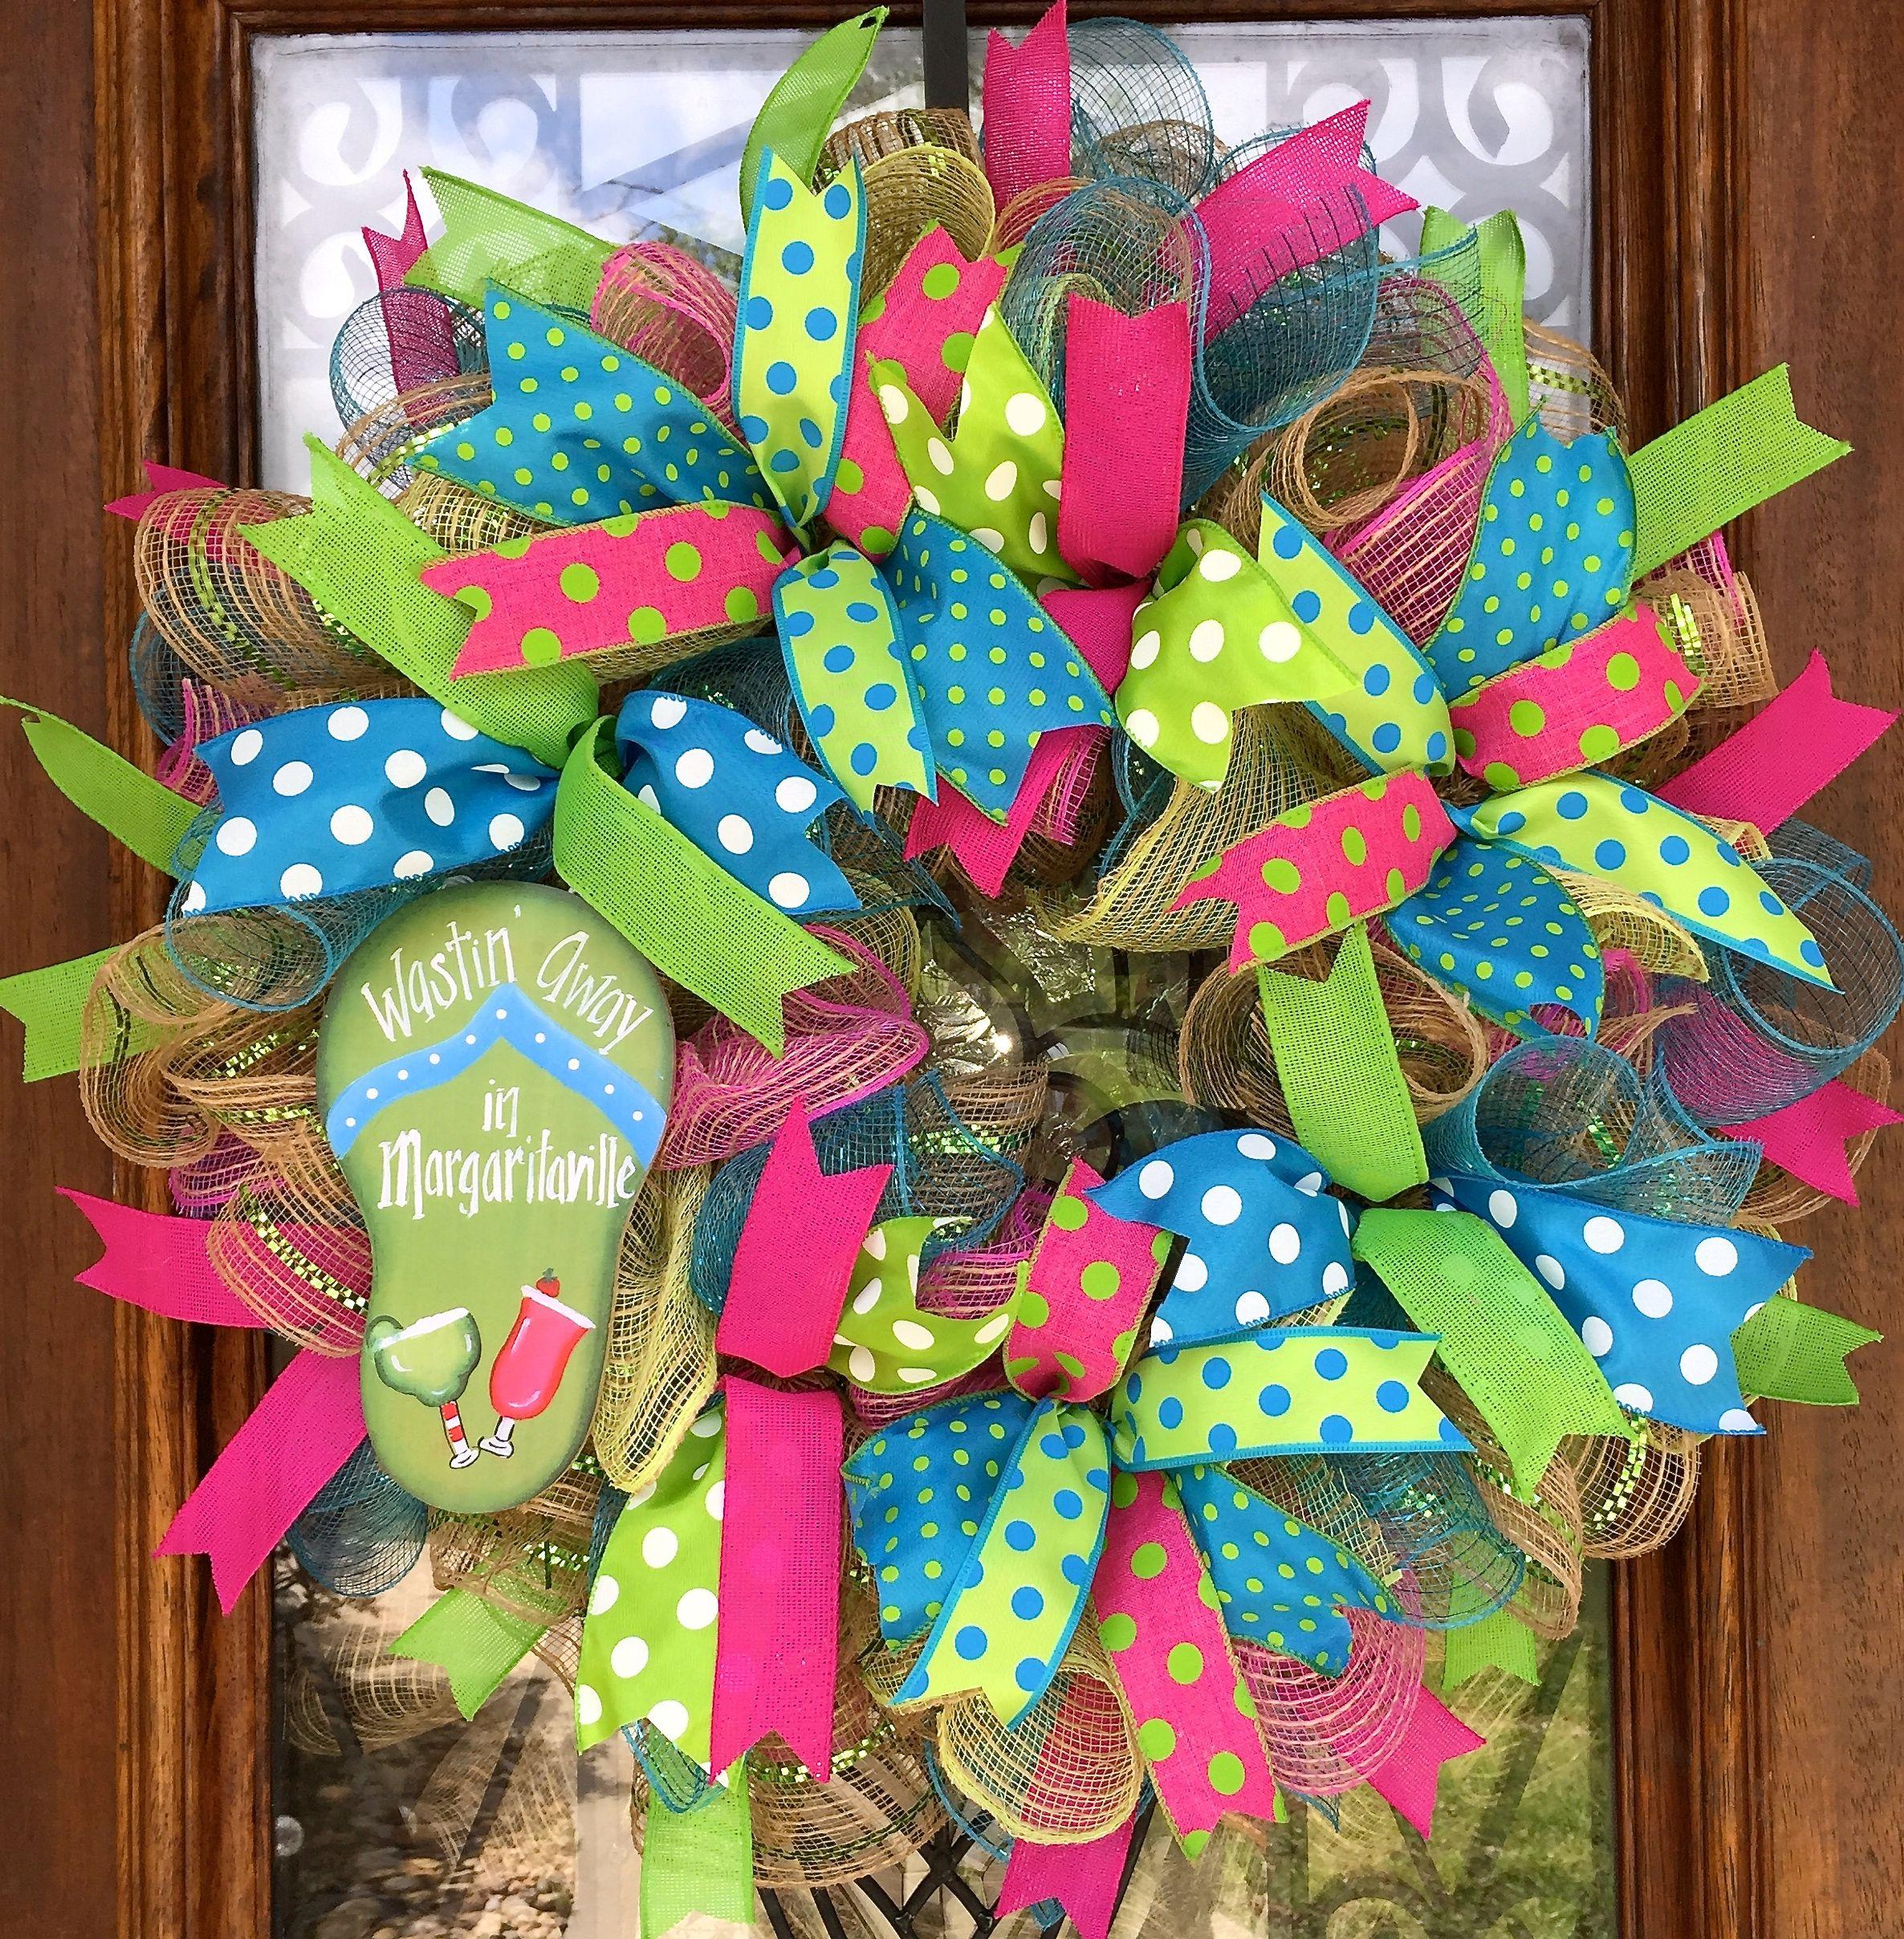 Margaritaville wreath, summer, bright colors, flip flops